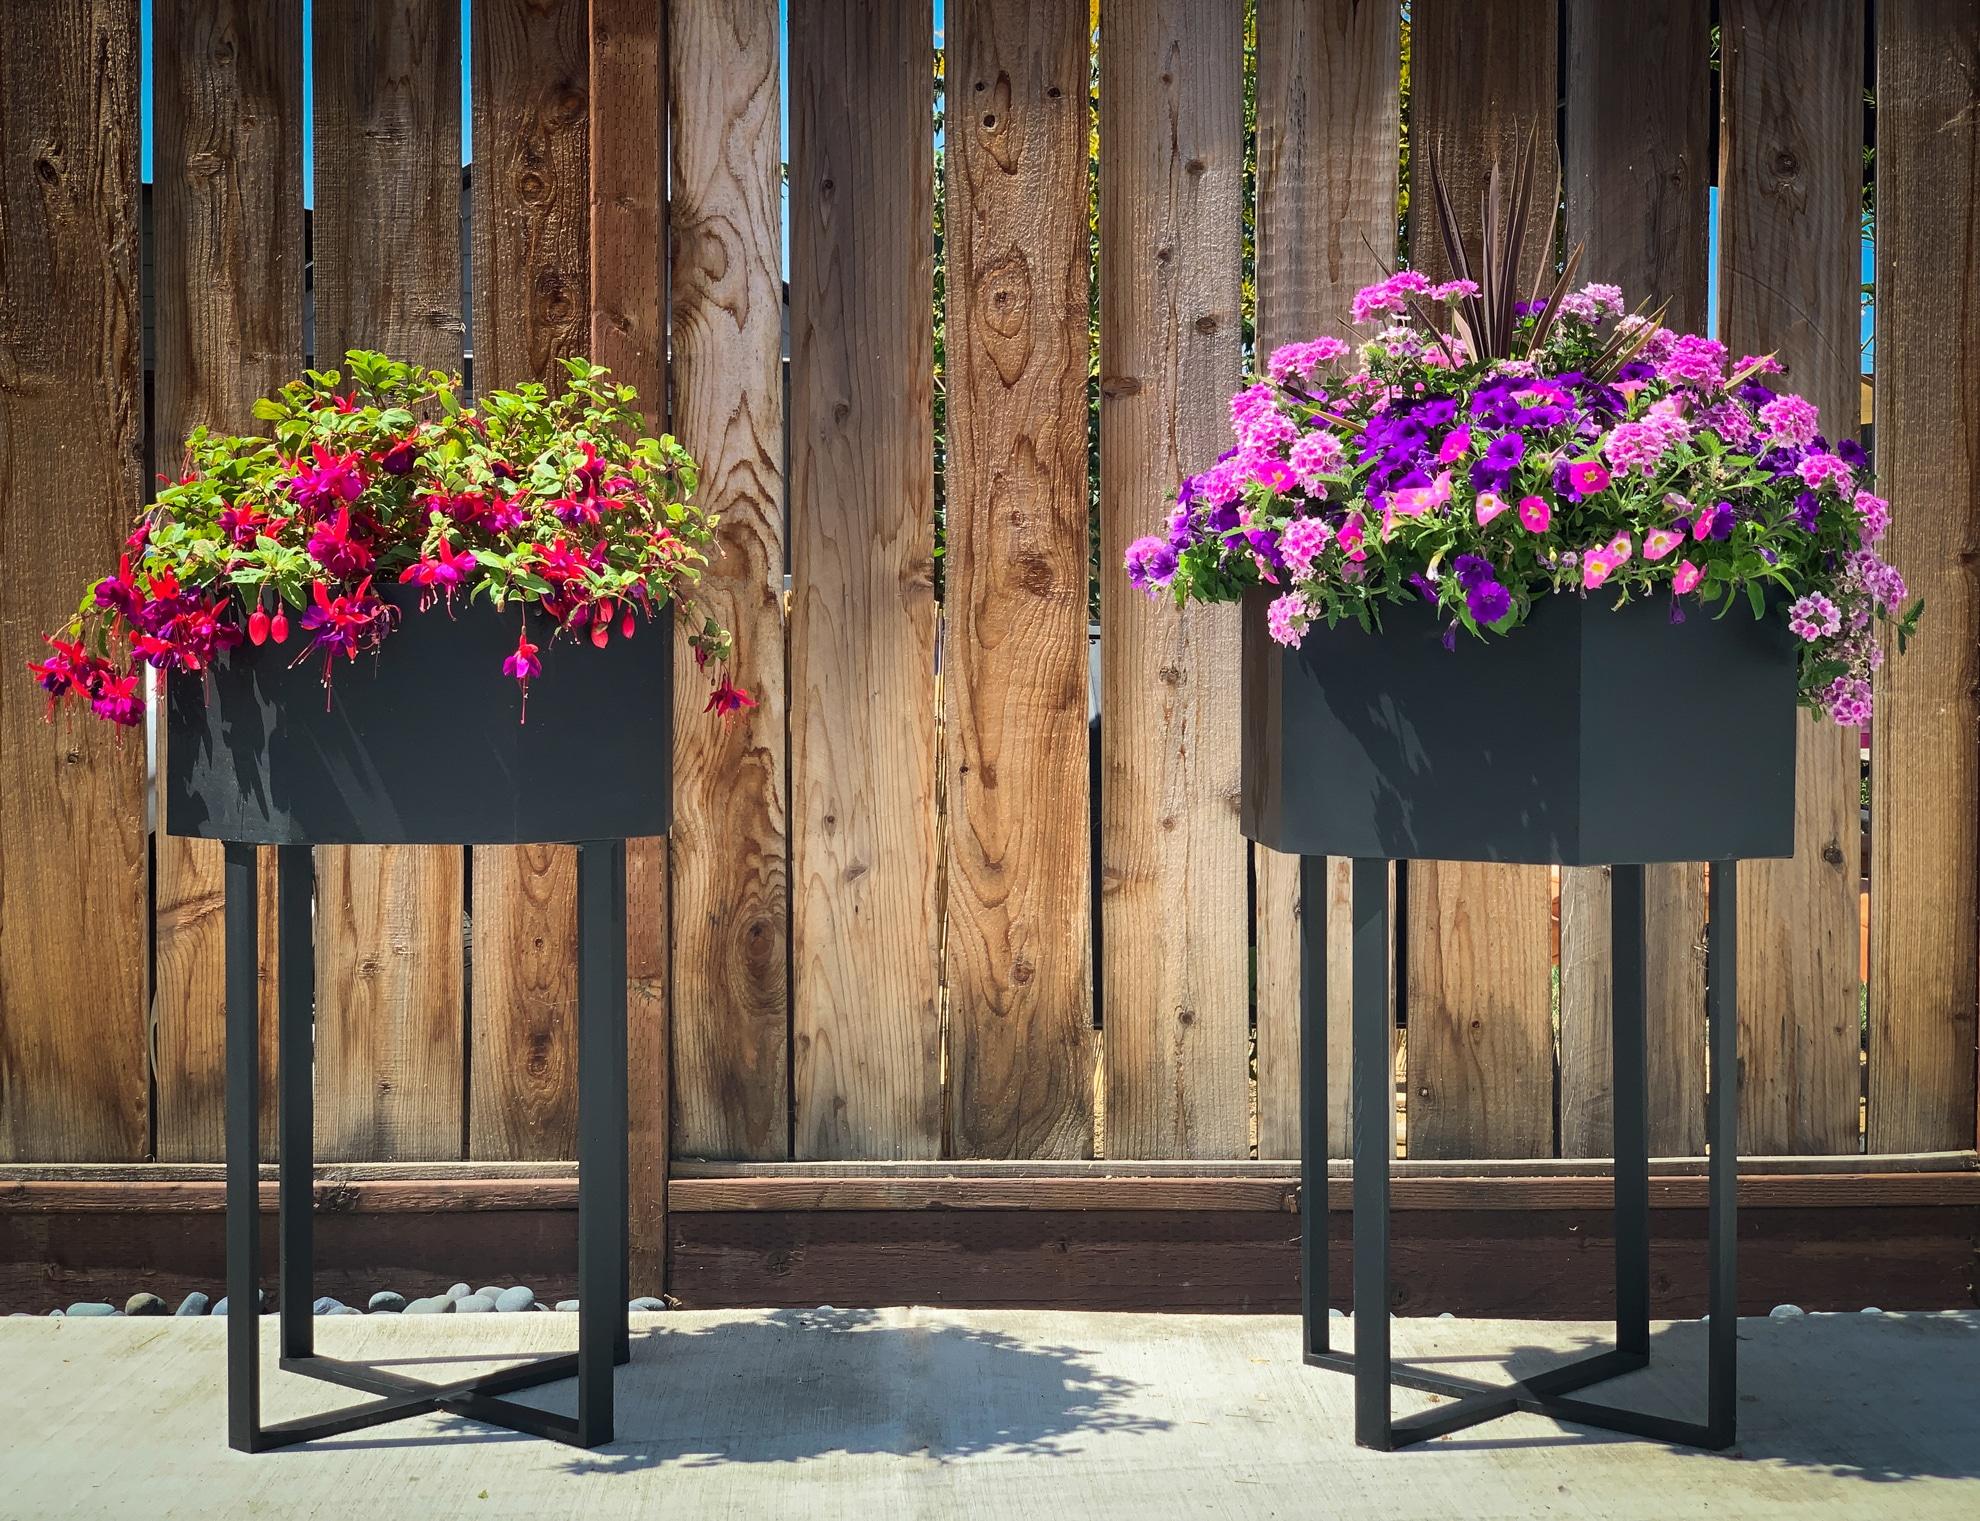 geometric standing planters, front view, portfolio